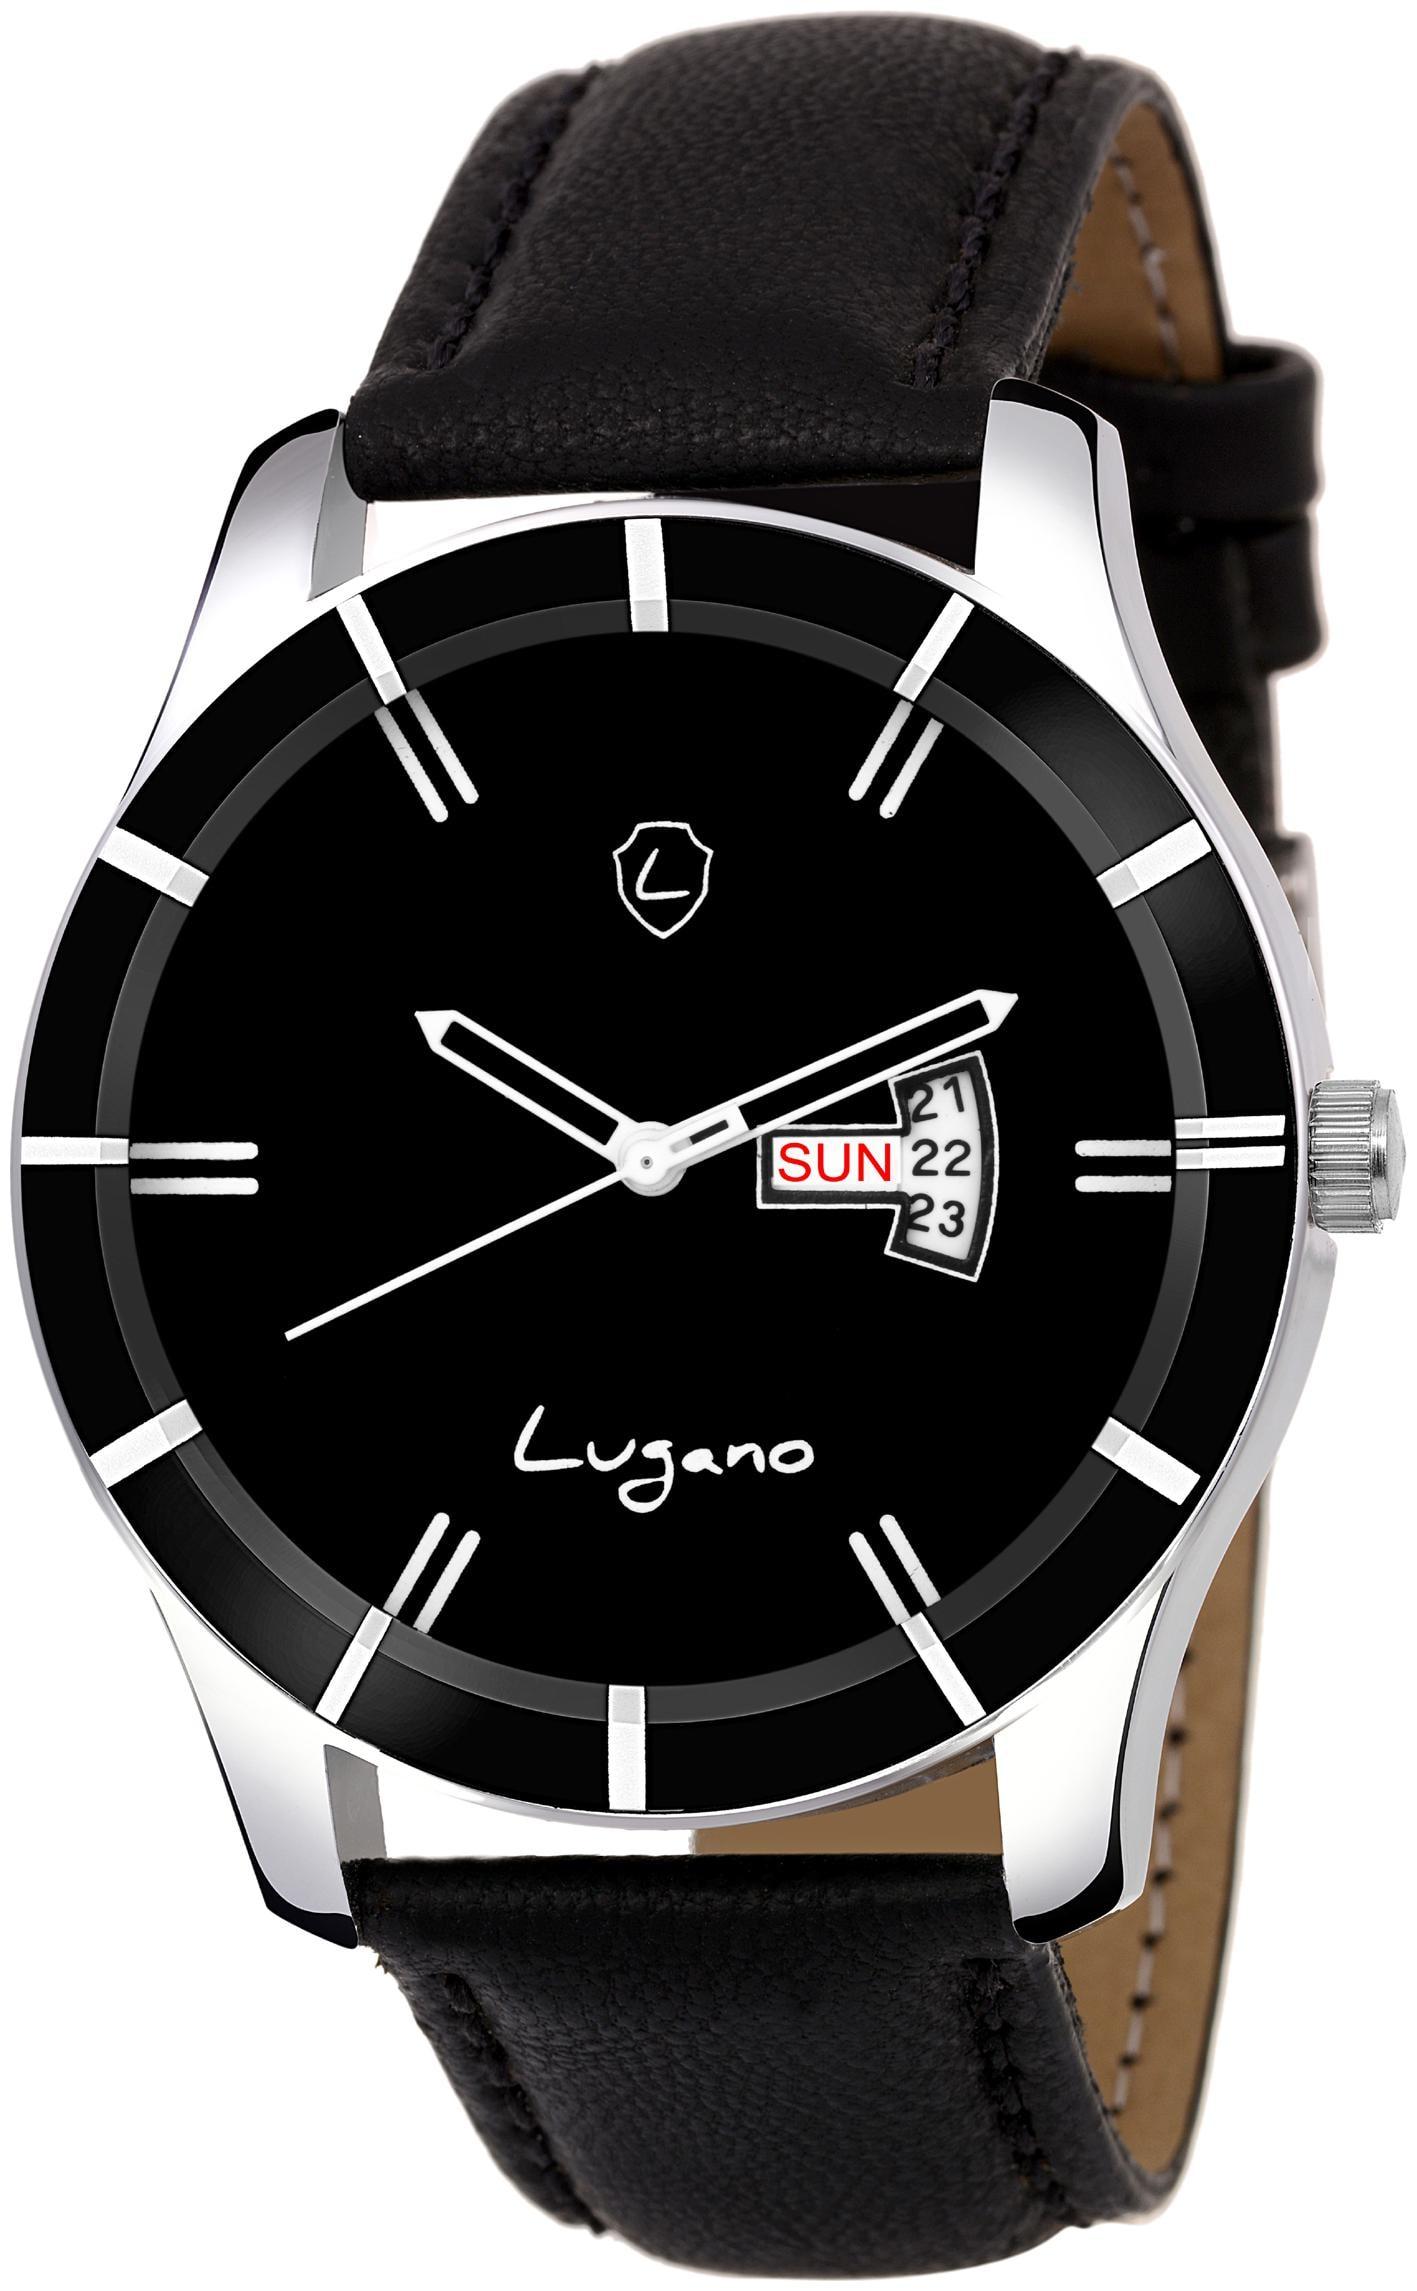 lugano LG 1184 Men Black   Analog Watch by Disha Enterprises